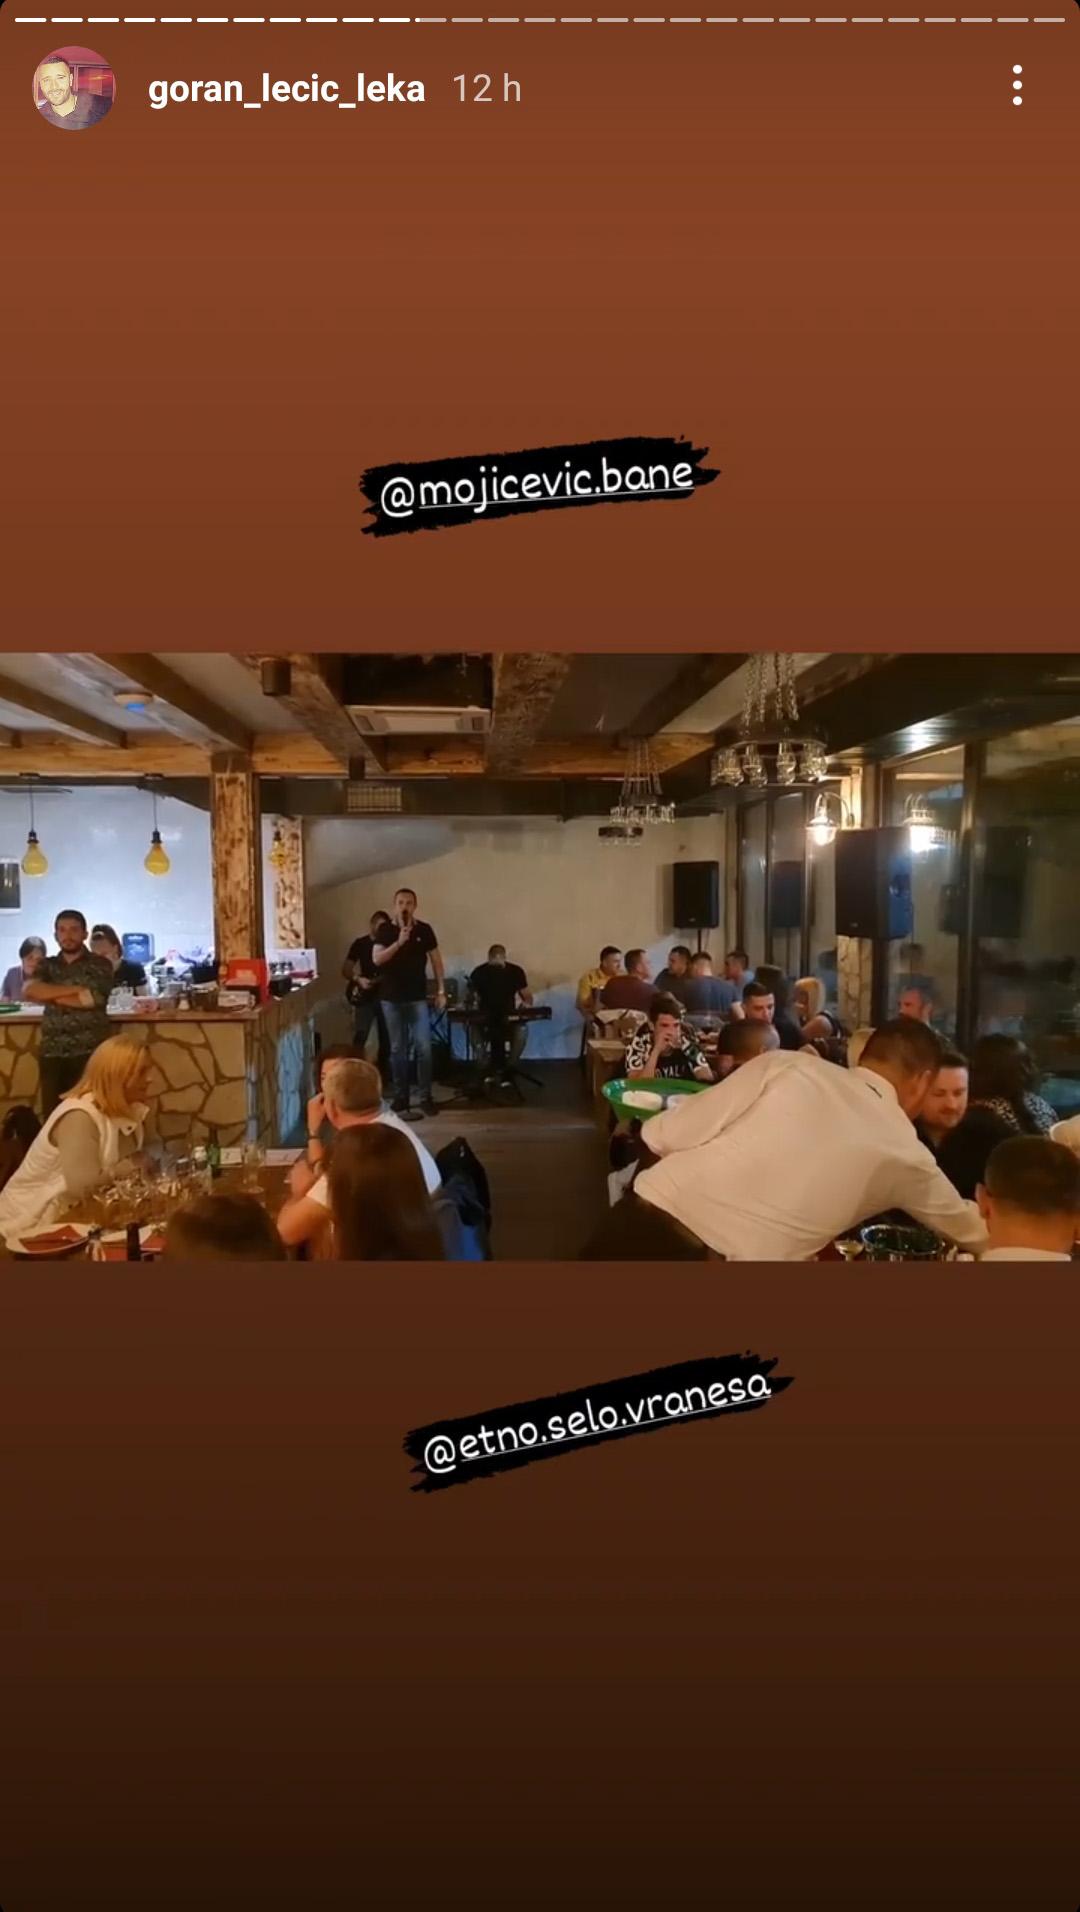 Goran Lečić Leka, Bane Mojićević Instagram